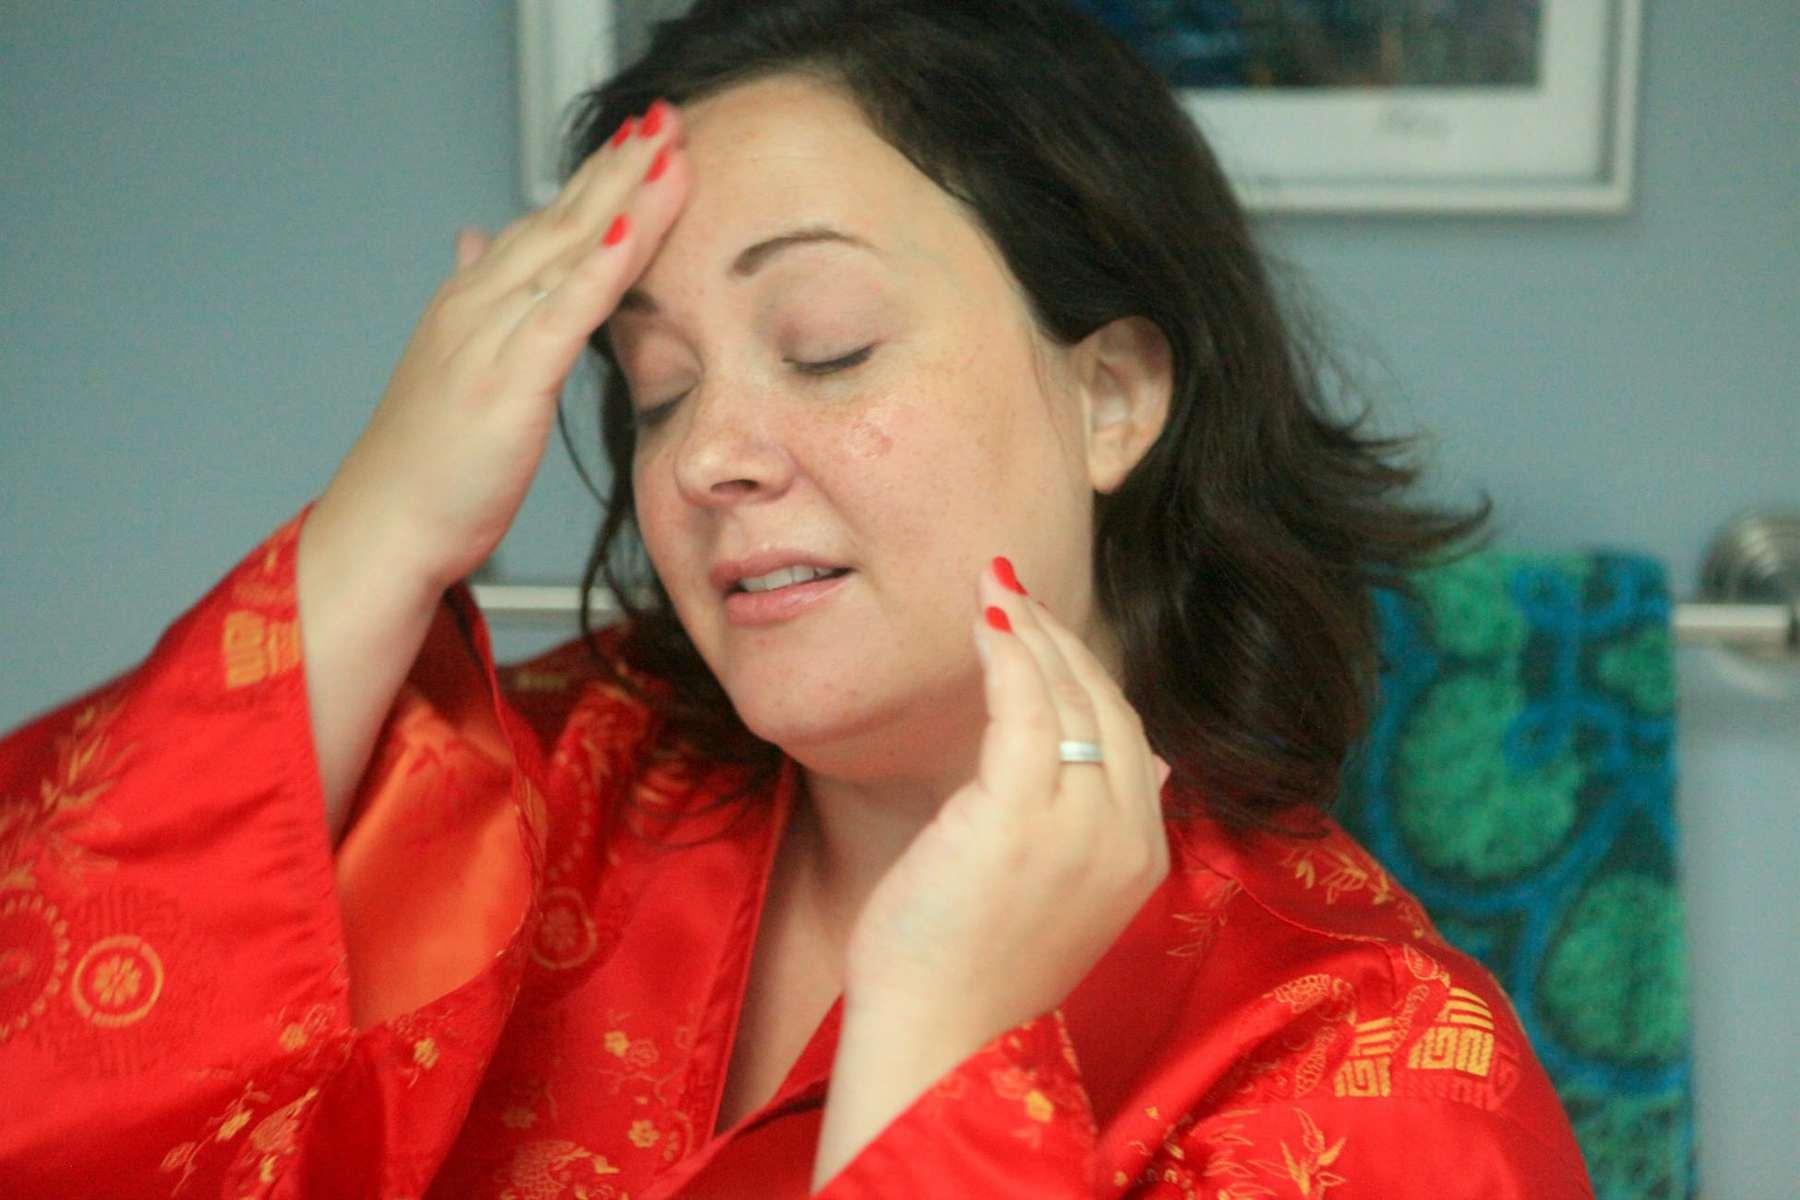 Wardrobe Oxygen's evening skincare routine featuring Colleen Rothschild